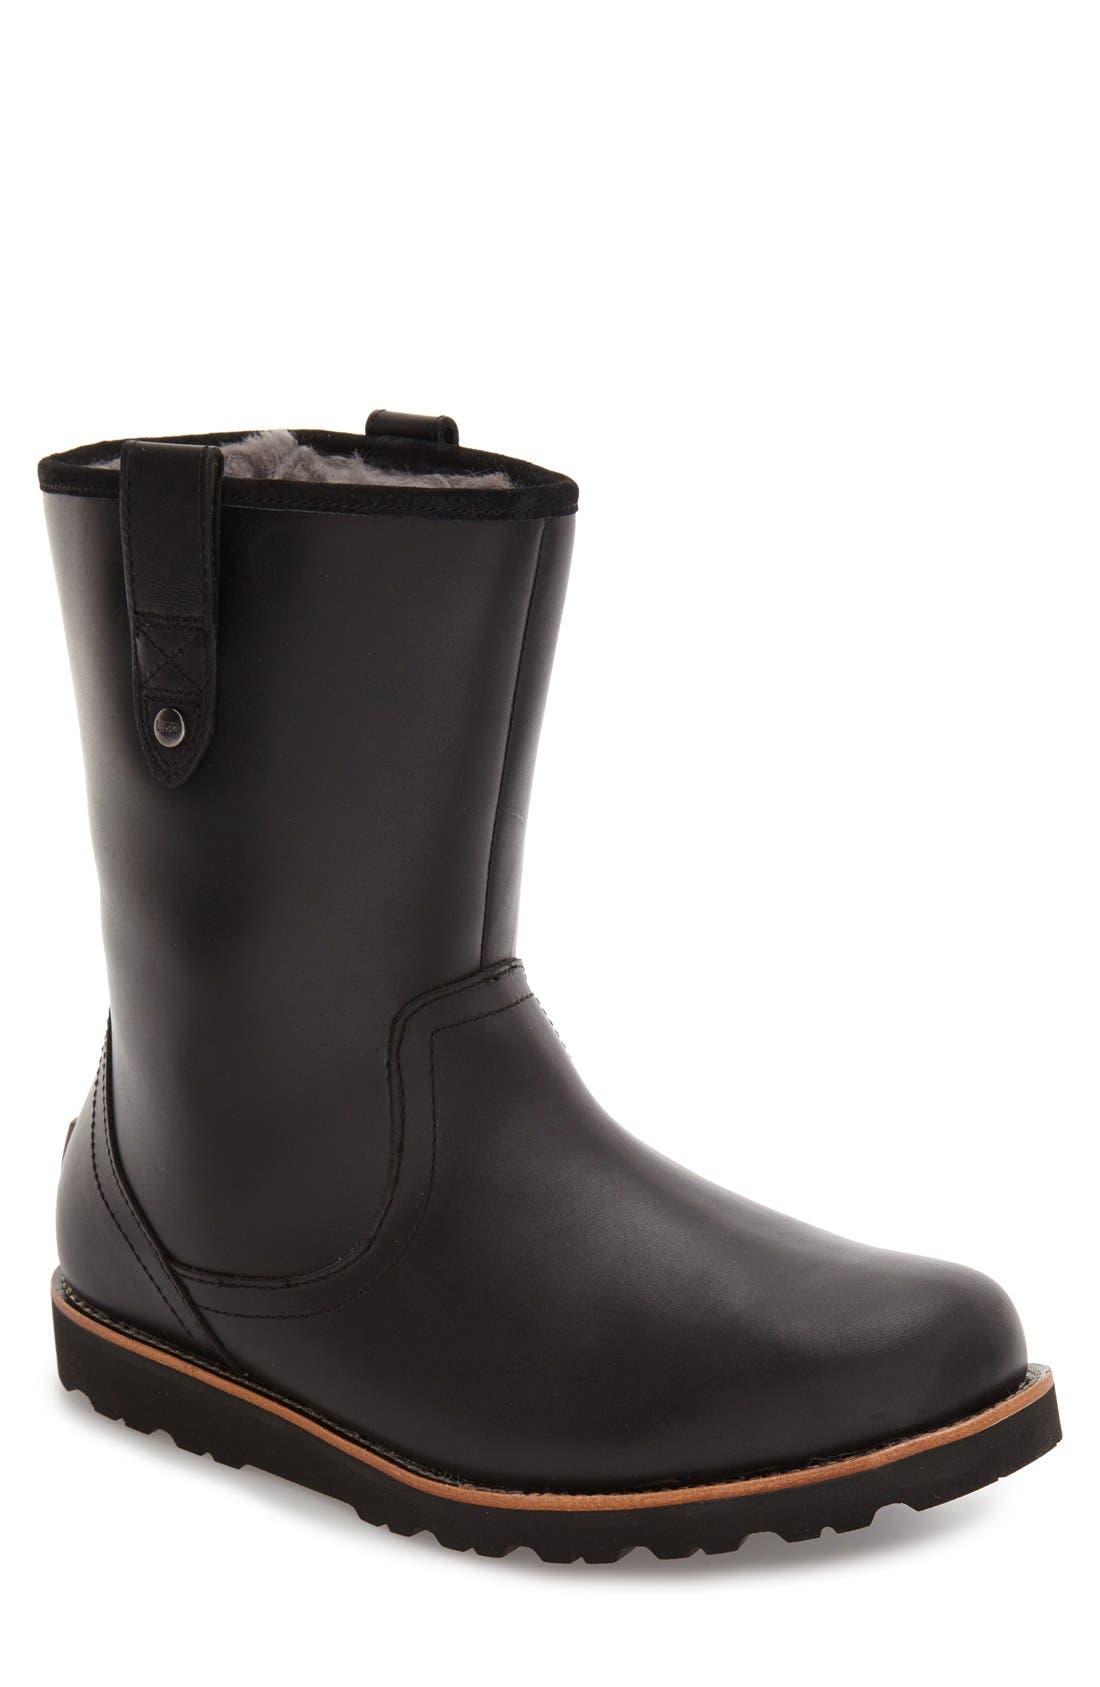 Alternate Image 1 Selected - UGG® Stoneman Waterproof Boot (Men)